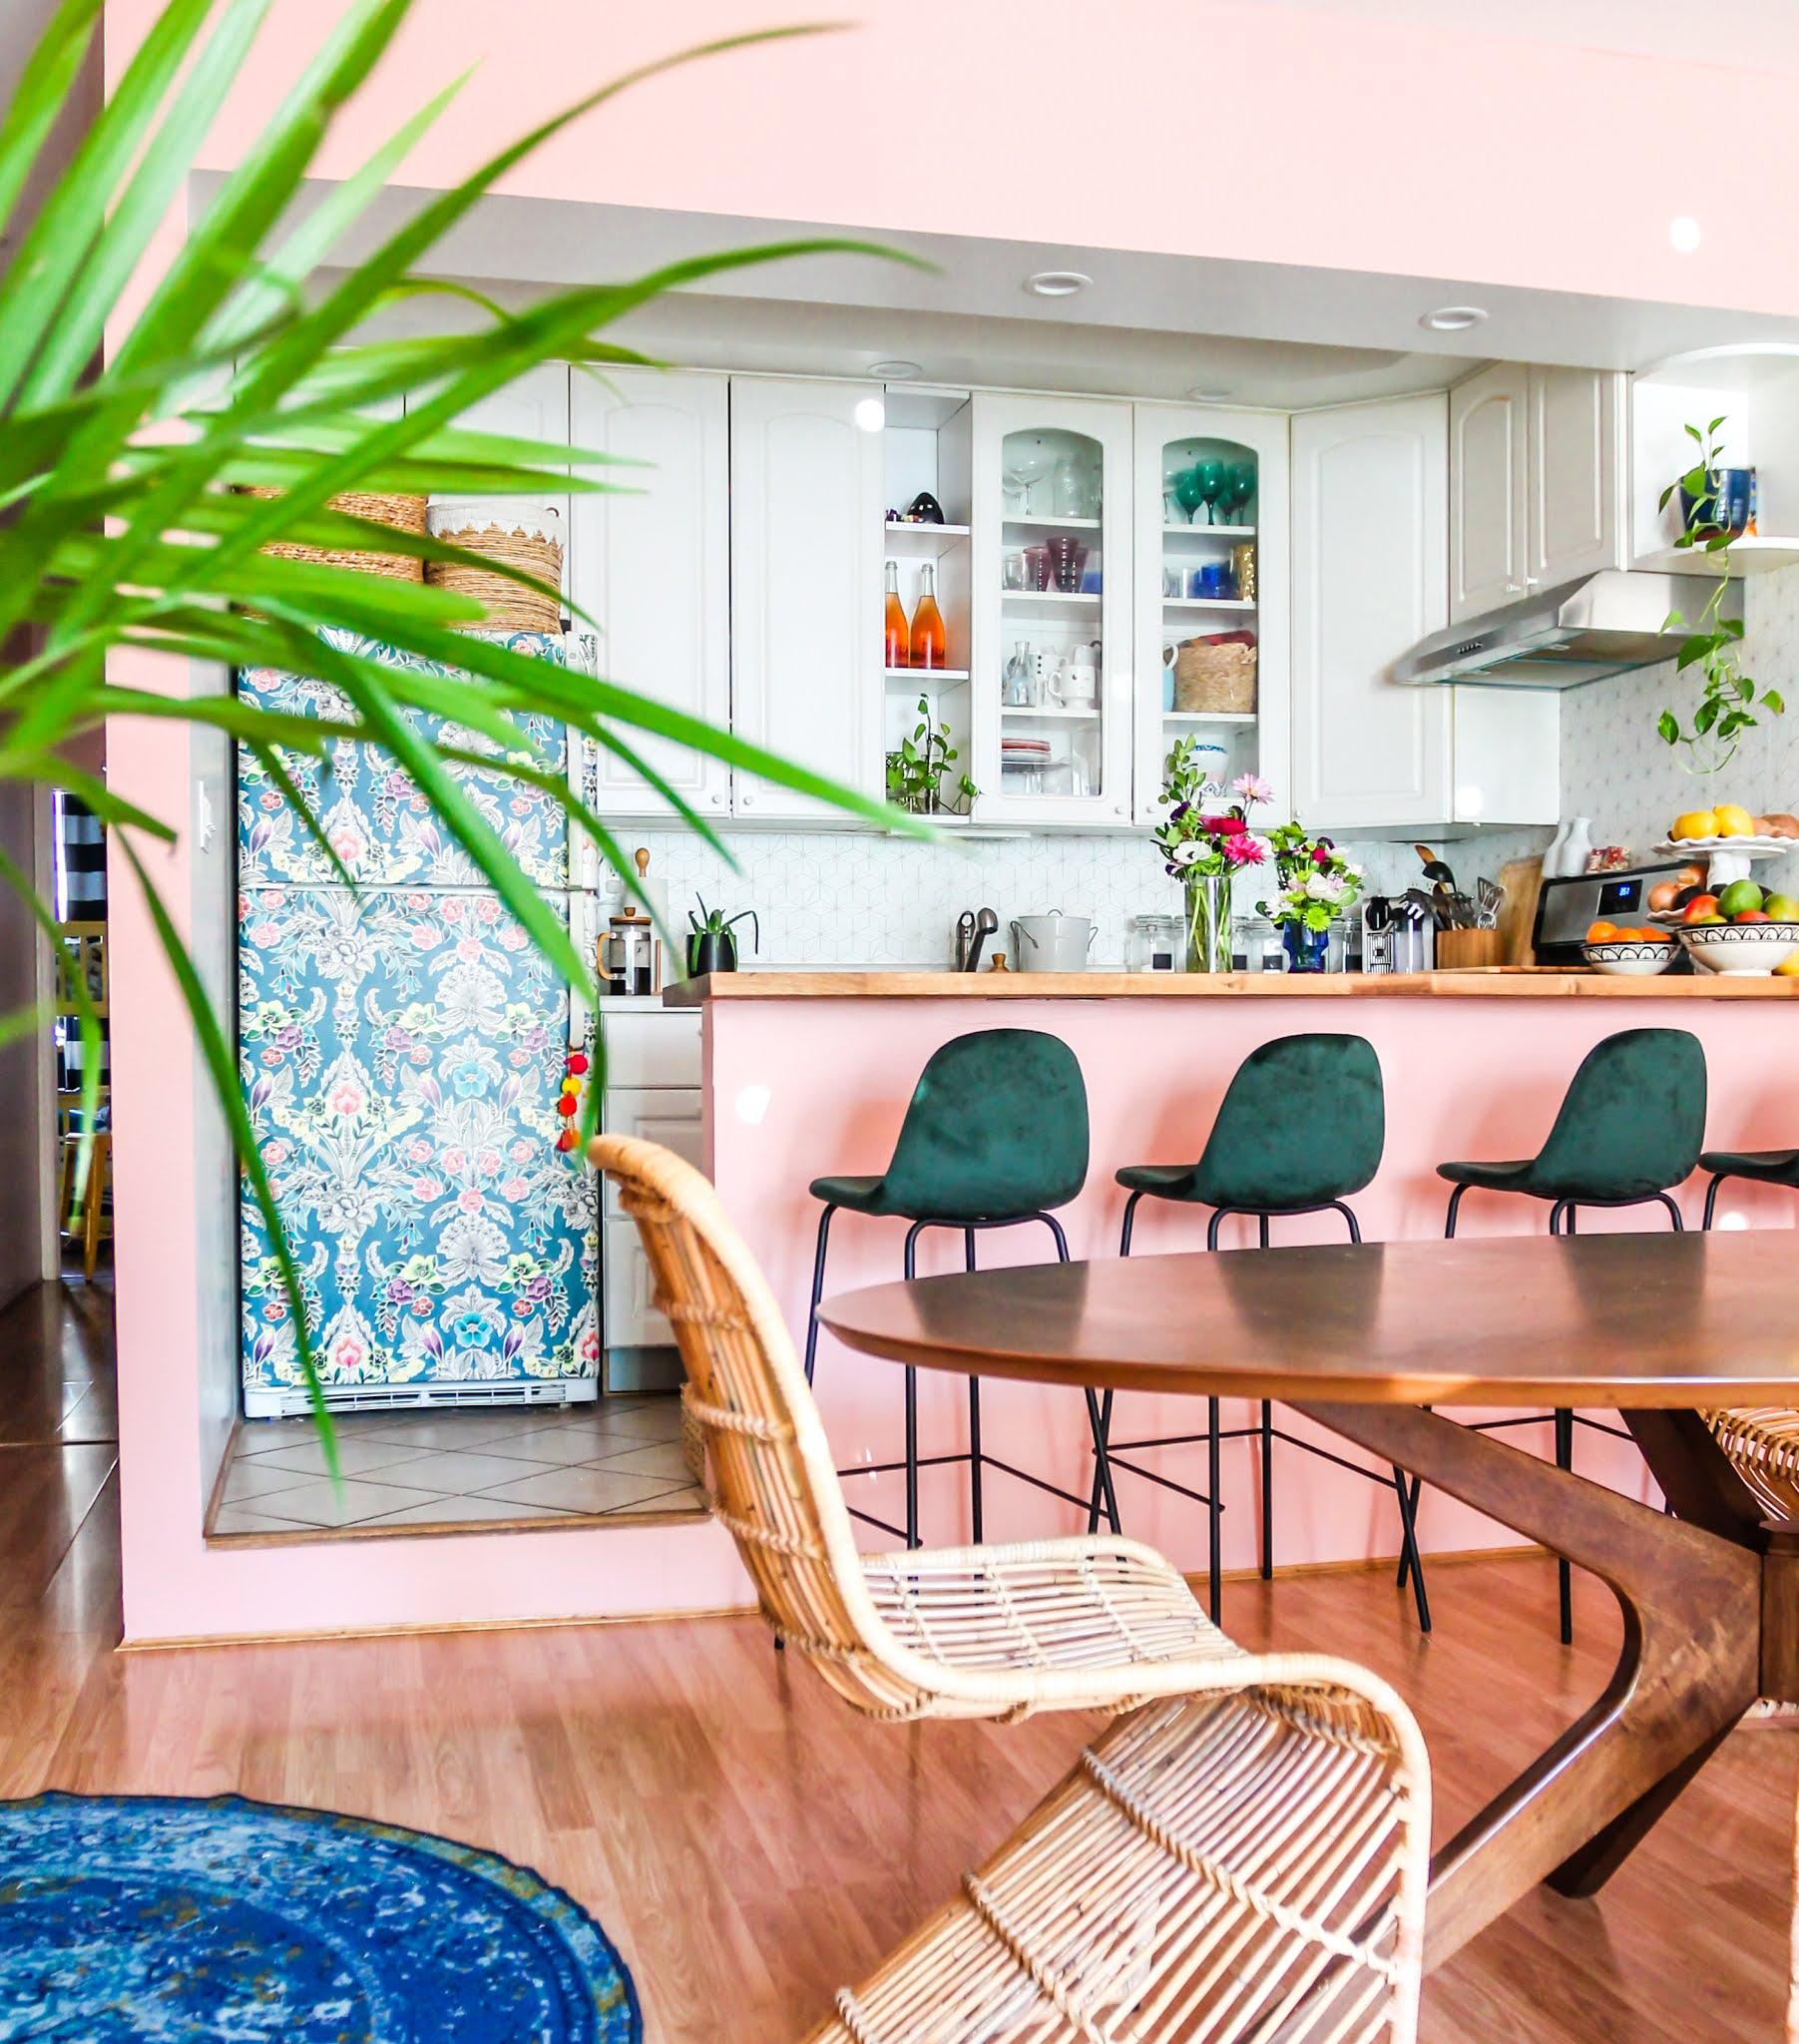 pink and green decor // green barstools // pink kitchen // diy wallpaper fridge // pink and green kitchen // colorful homes // Megan Zietz  Apartment // TfDiaries // pink and green room // pink and green Inspo // barstool inspo // velvet barstools